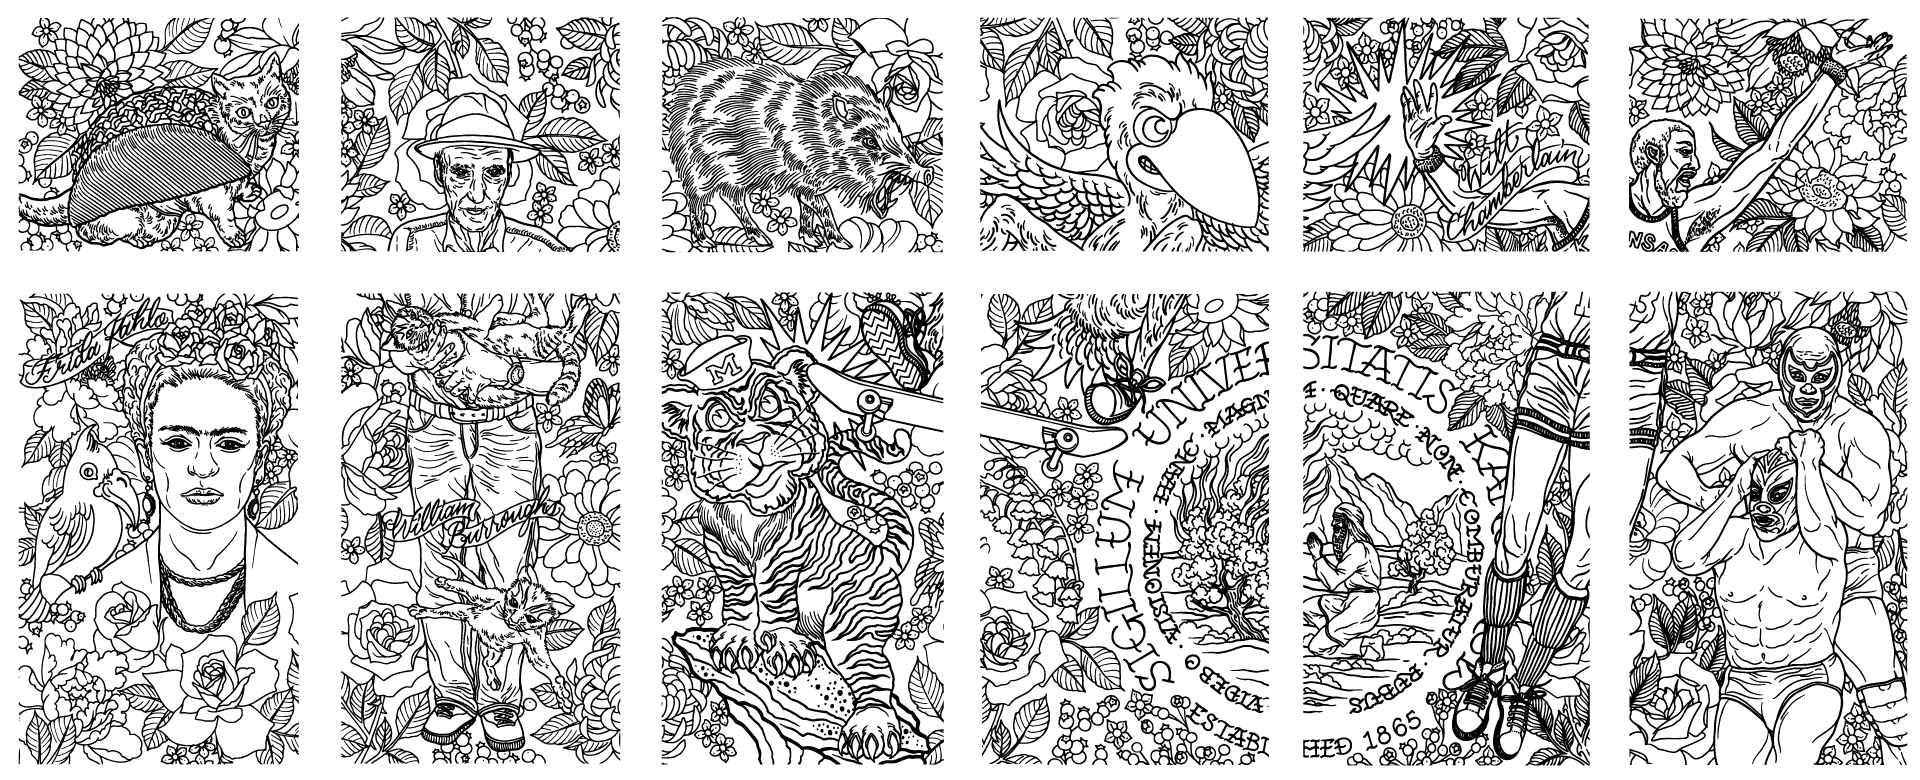 PF-Windows-1